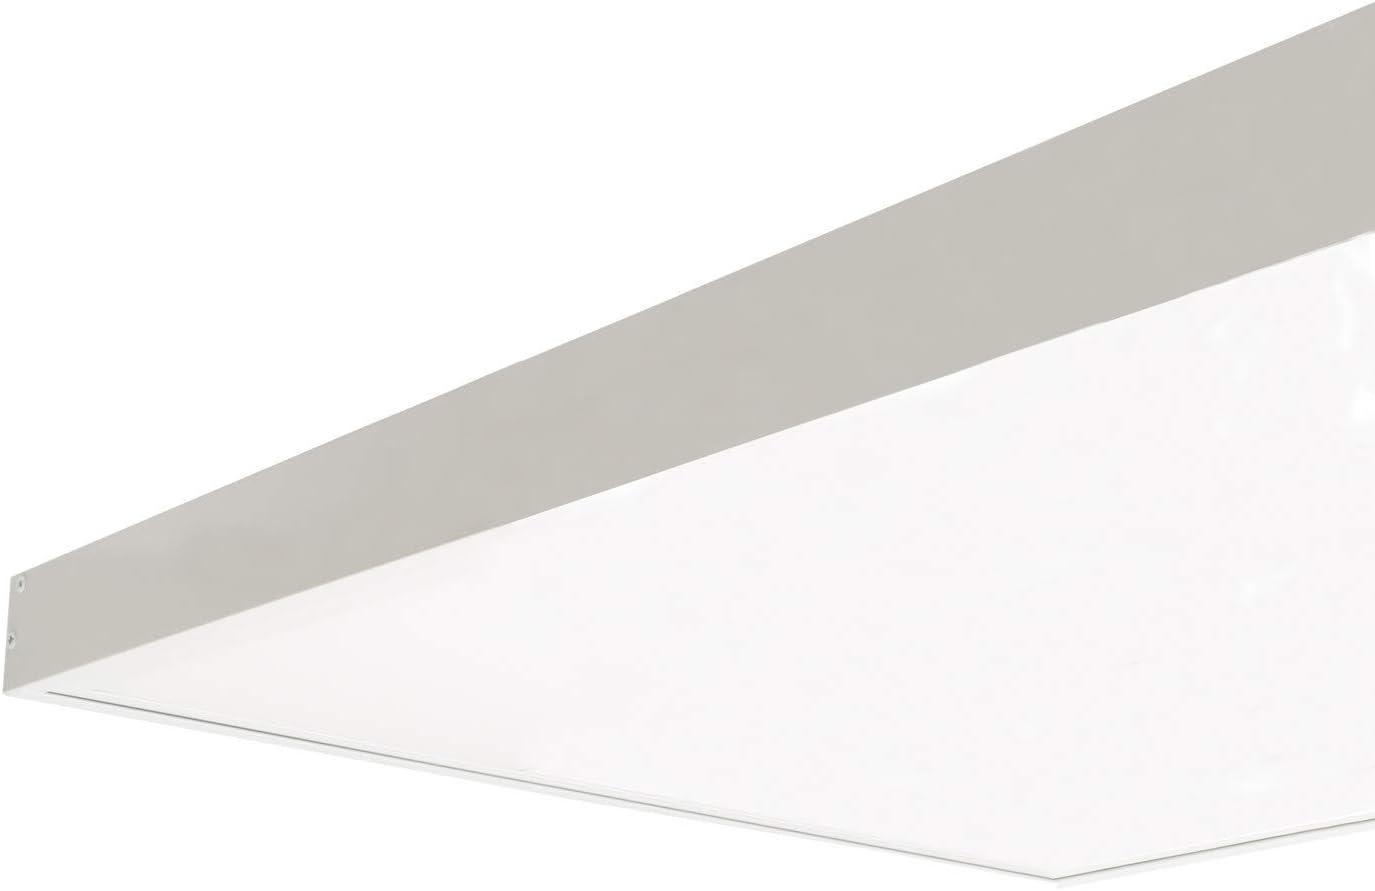 Kit de Superficie Paneles Slim 120x60cm BlancoBlanco